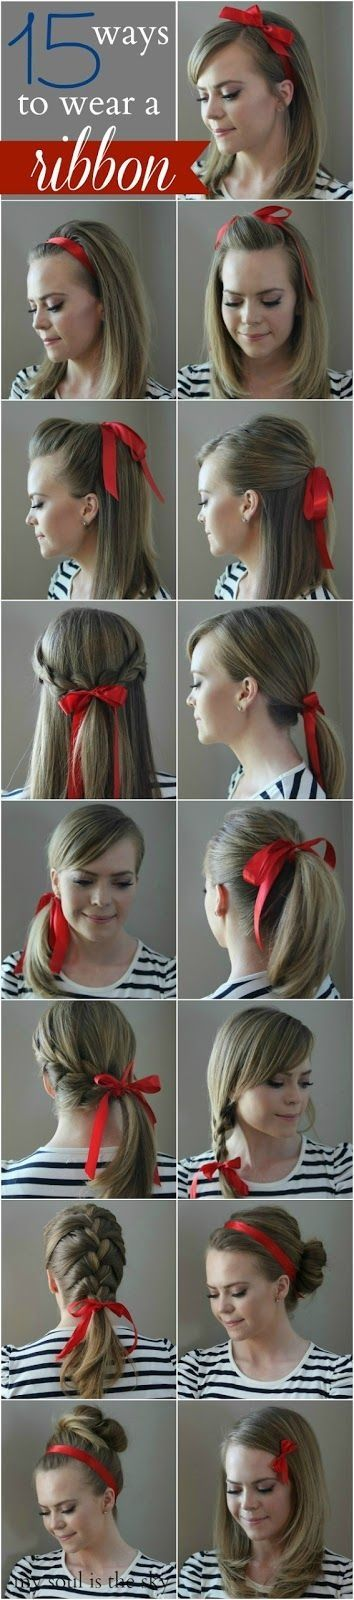 15 ways to wear a ribbon diy craft crafts craft ideas easy crafts diy ideas diy crafts easy diy diy hair diy bow craft bow craft accessories